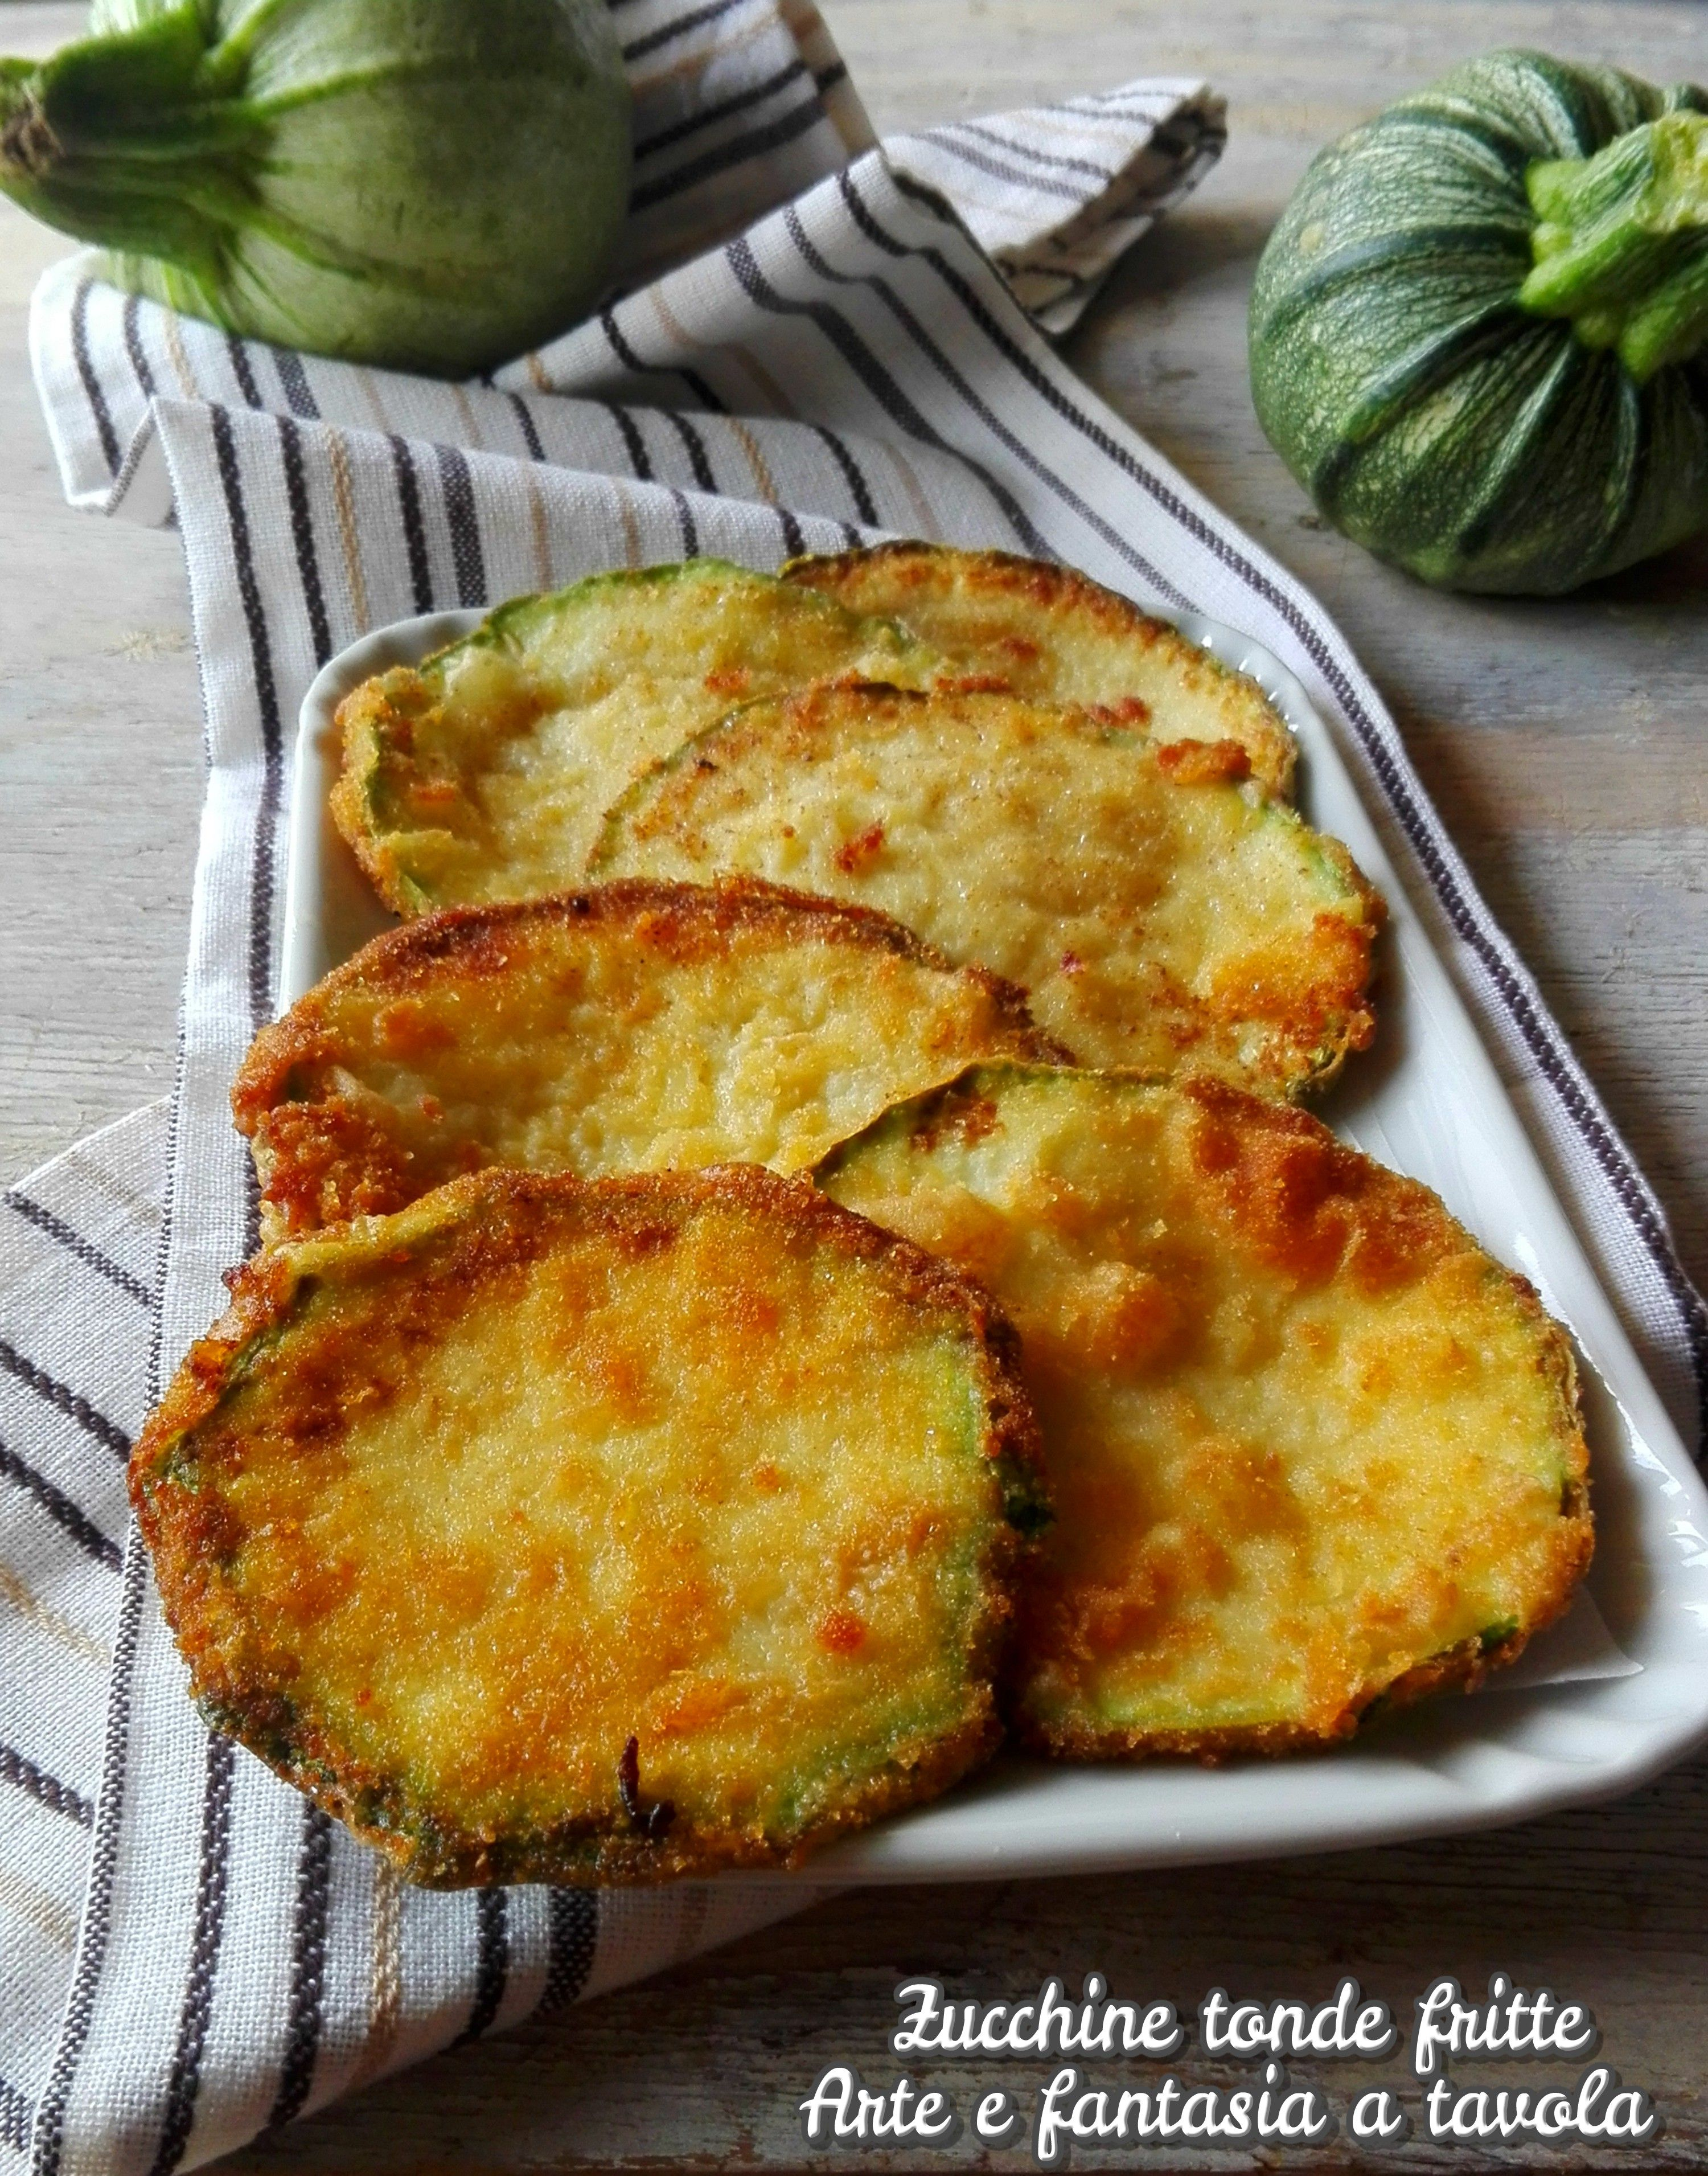 Photo of Zucchine tonde fritte